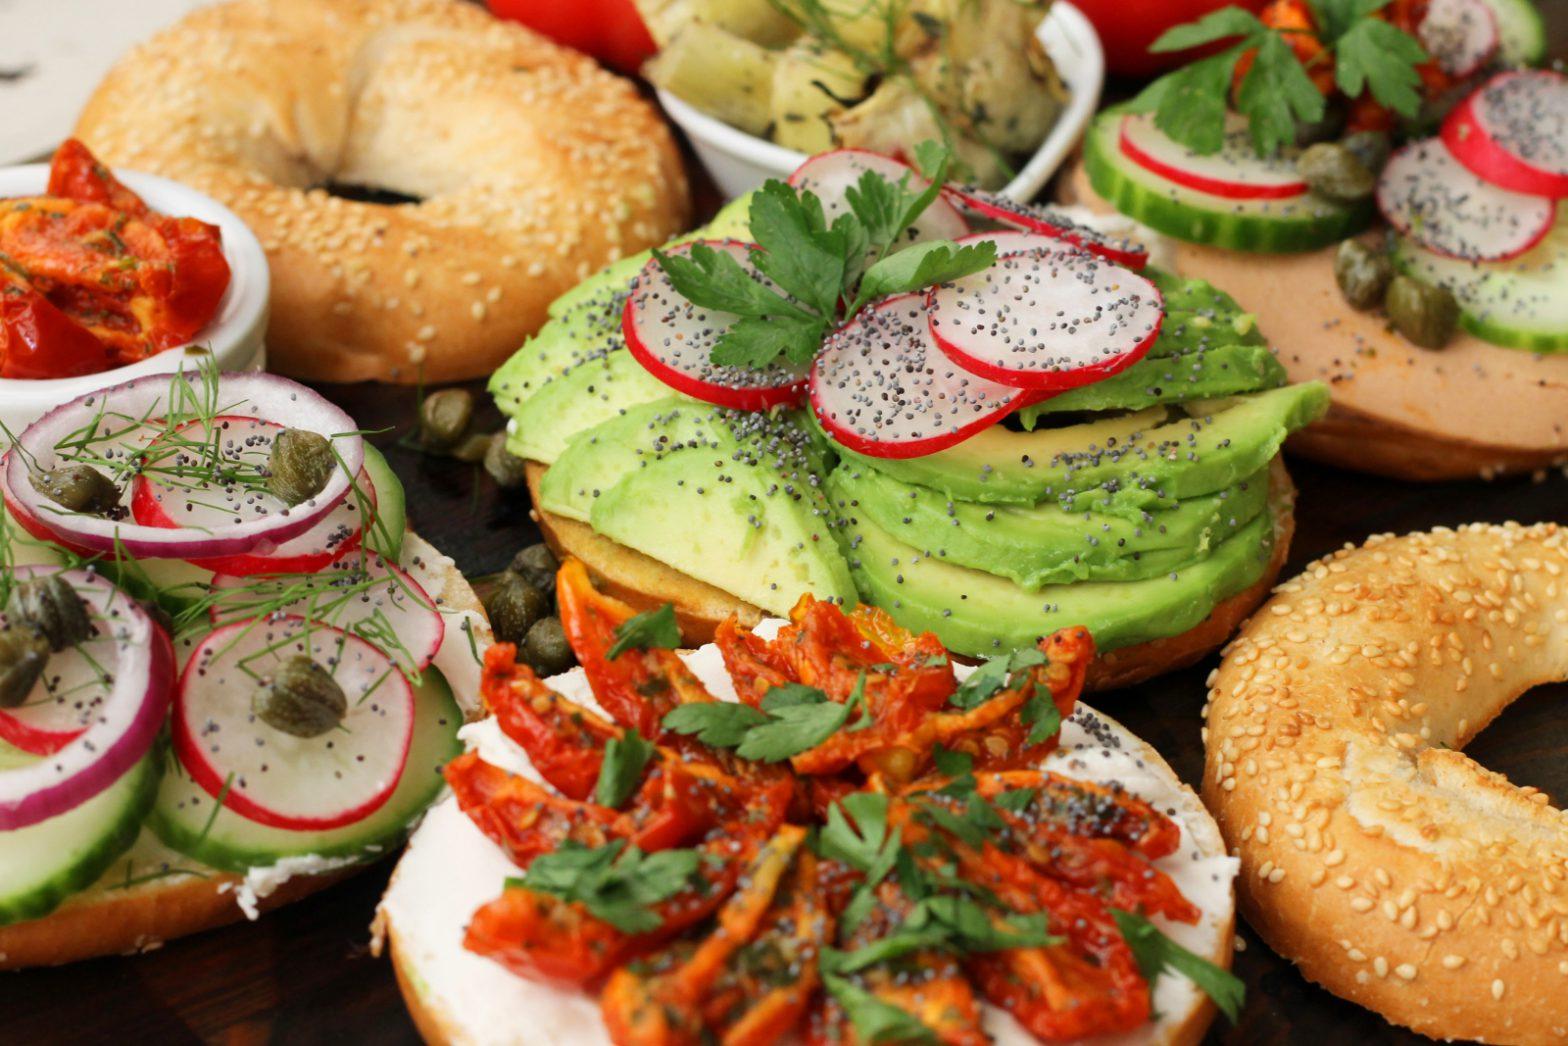 Deli-style Sandwich or Wrap